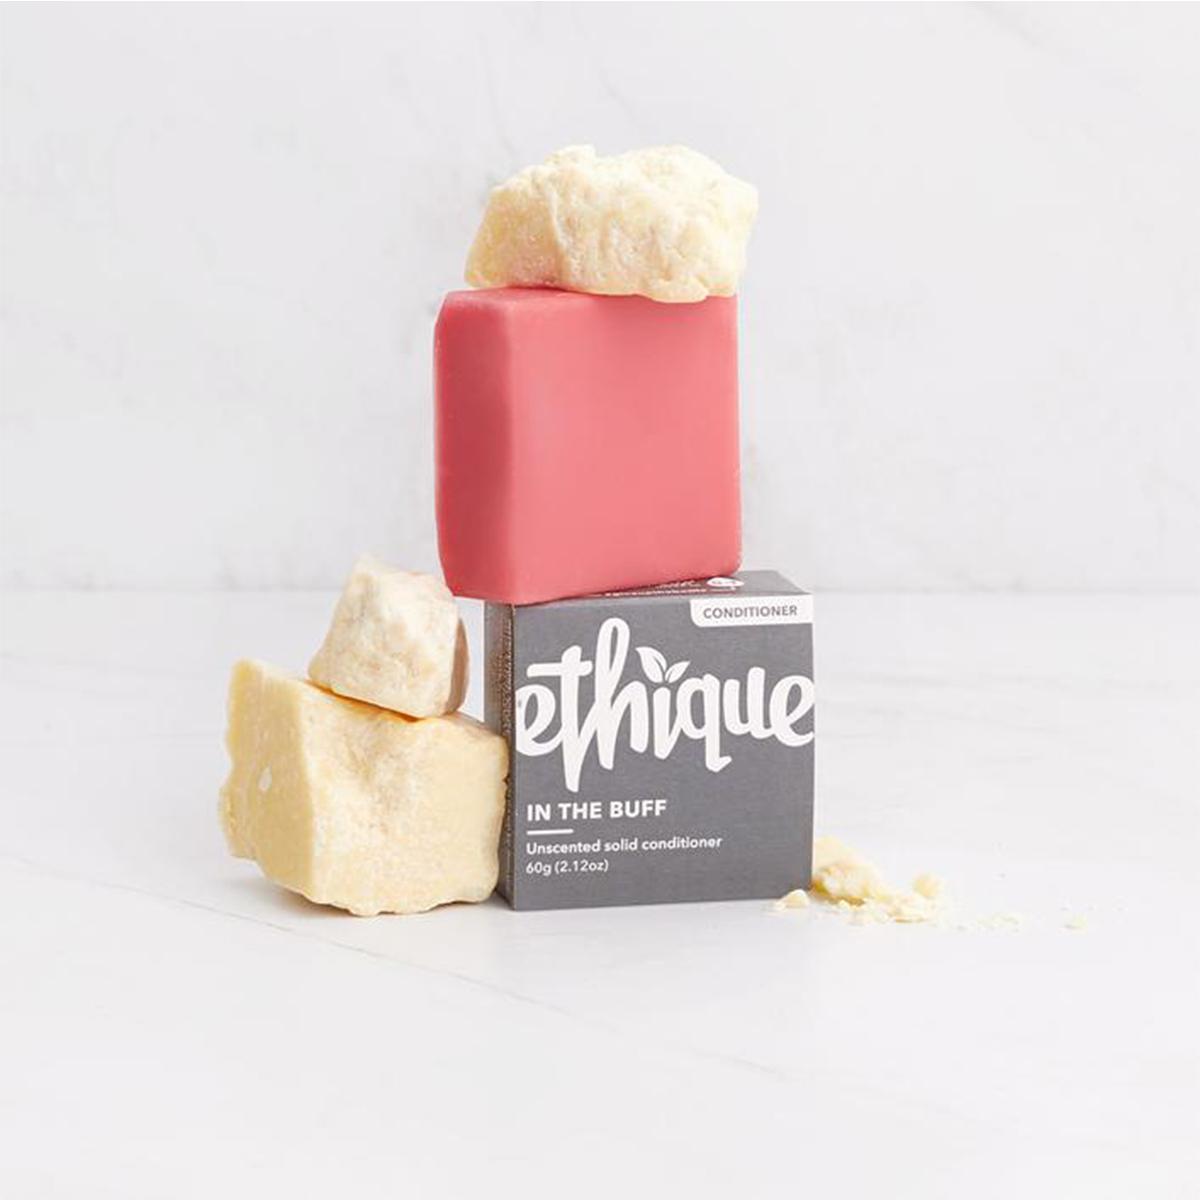 A box and naked shampoo bar, arranged for a photo.